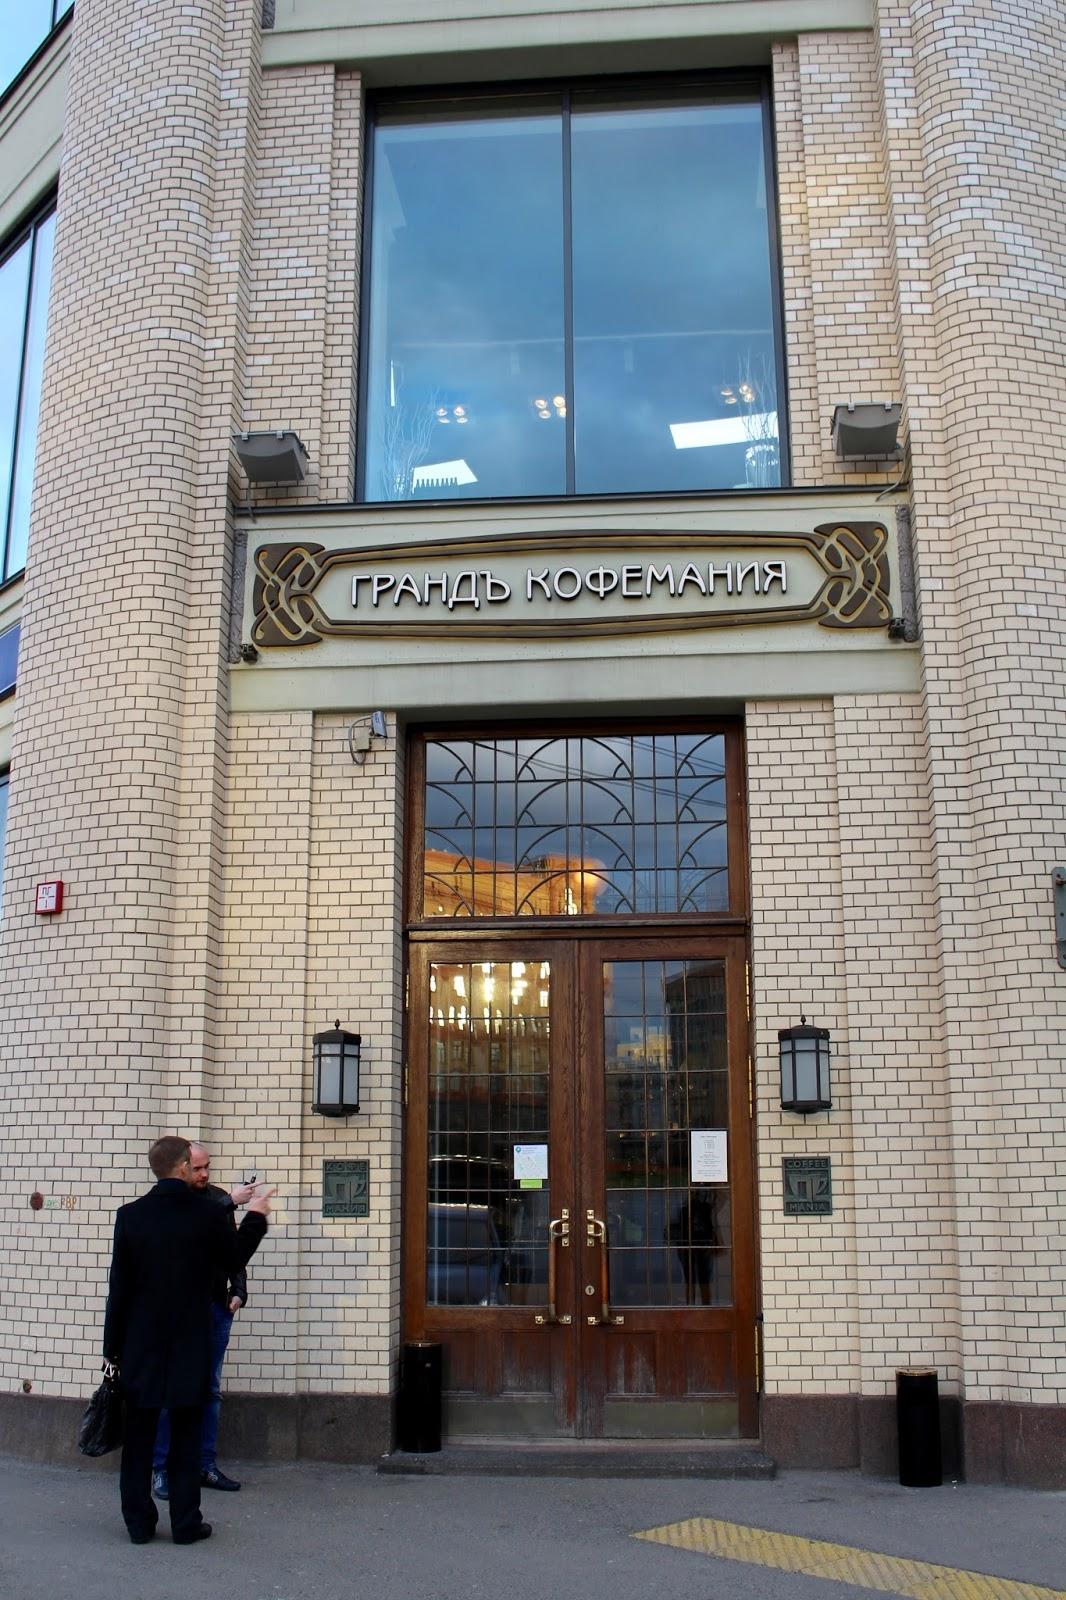 Moscow's best coffee spots - Coffeemania